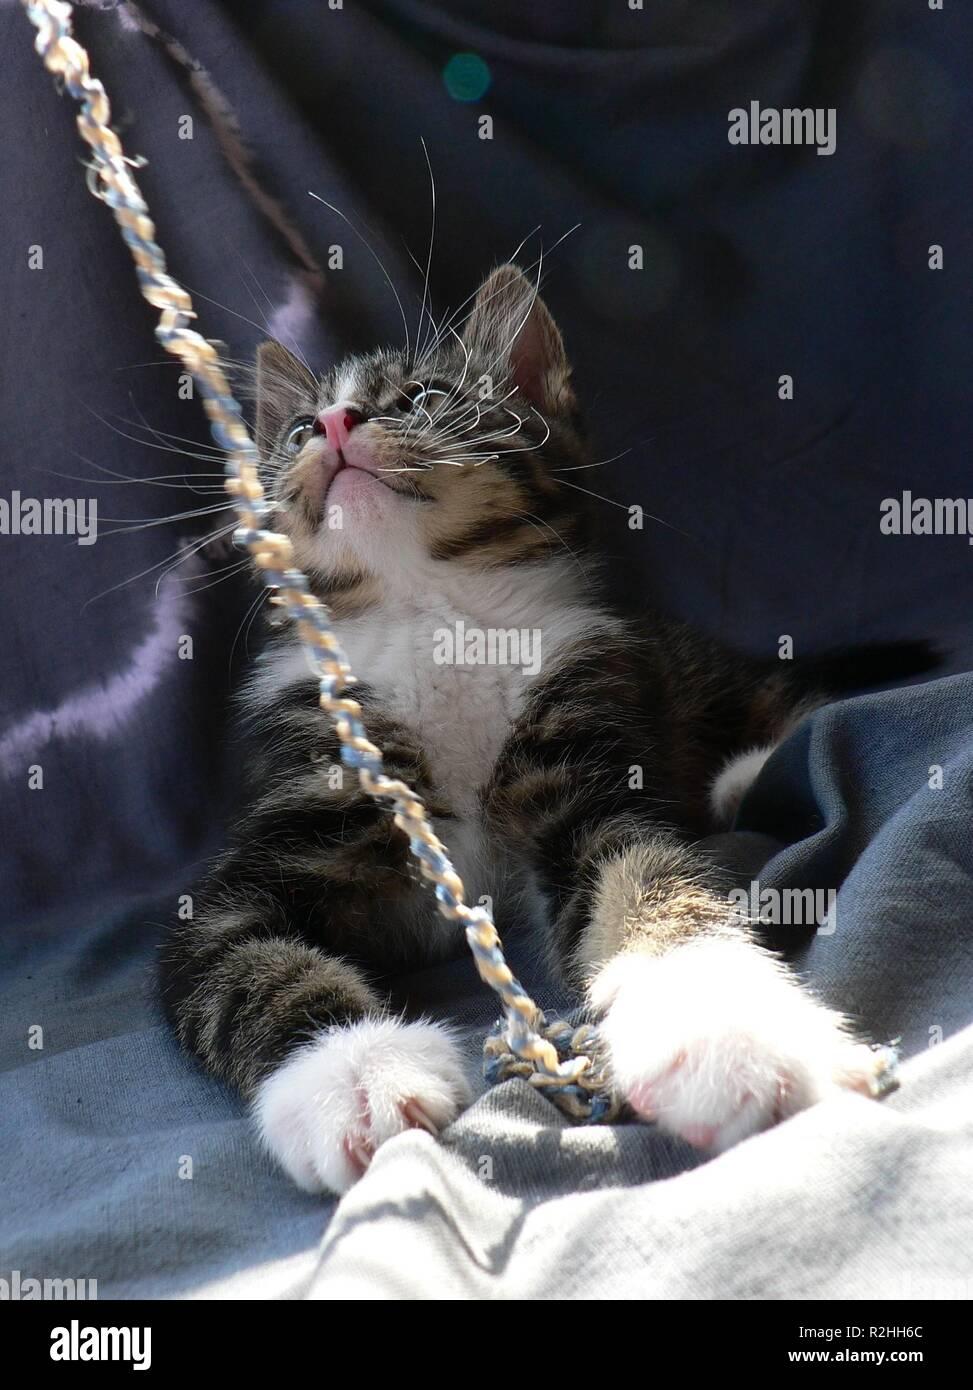 catching the yarn Stock Photo